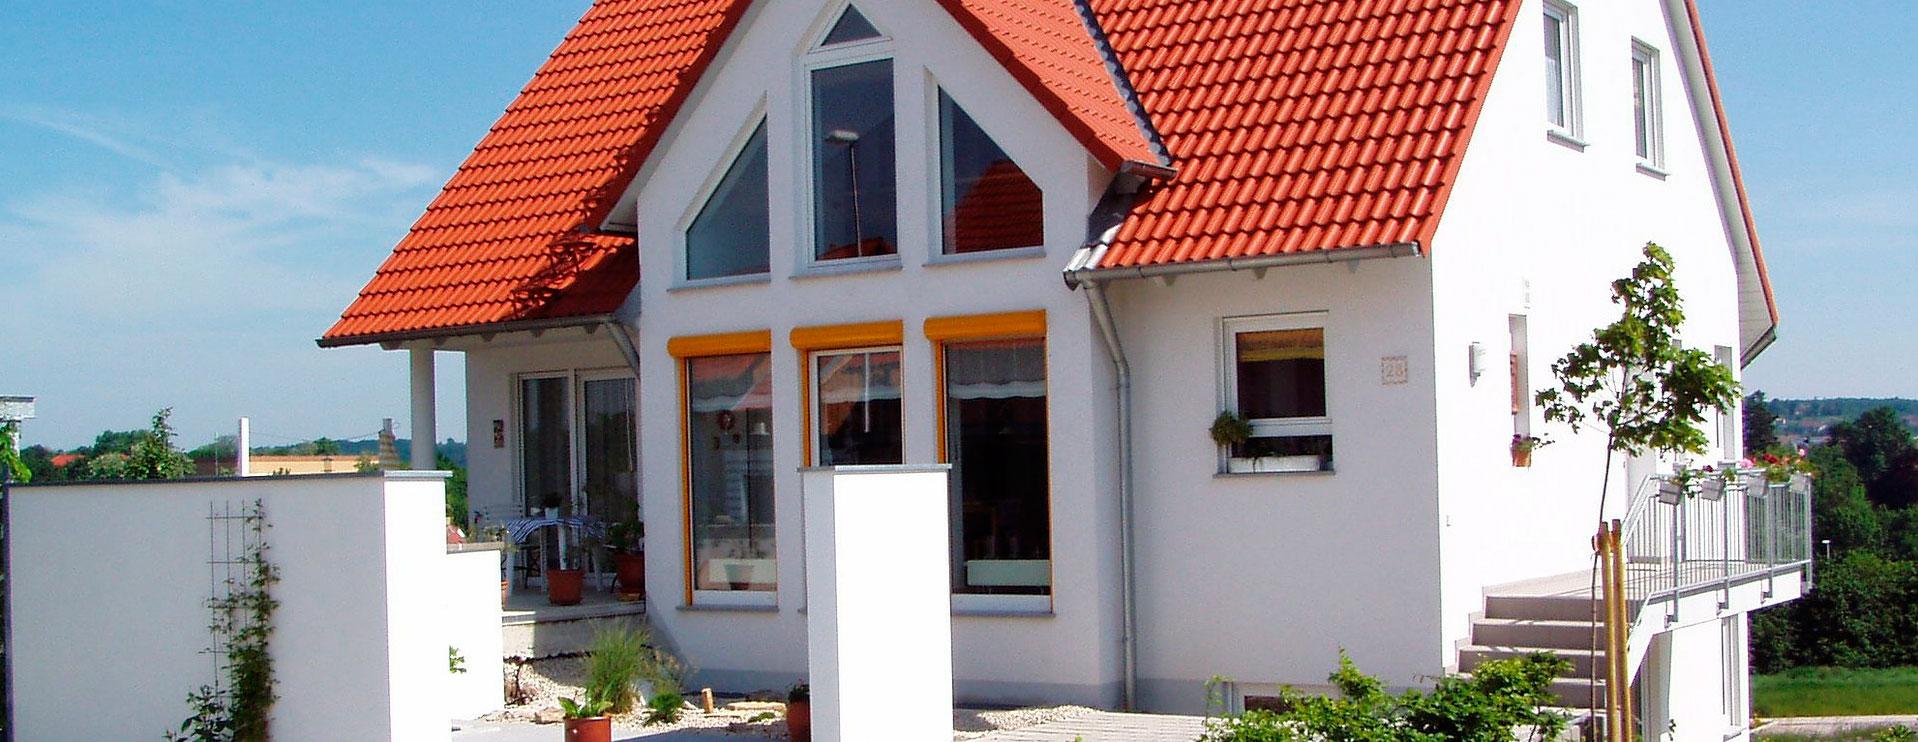 seguro de hogar para particulares